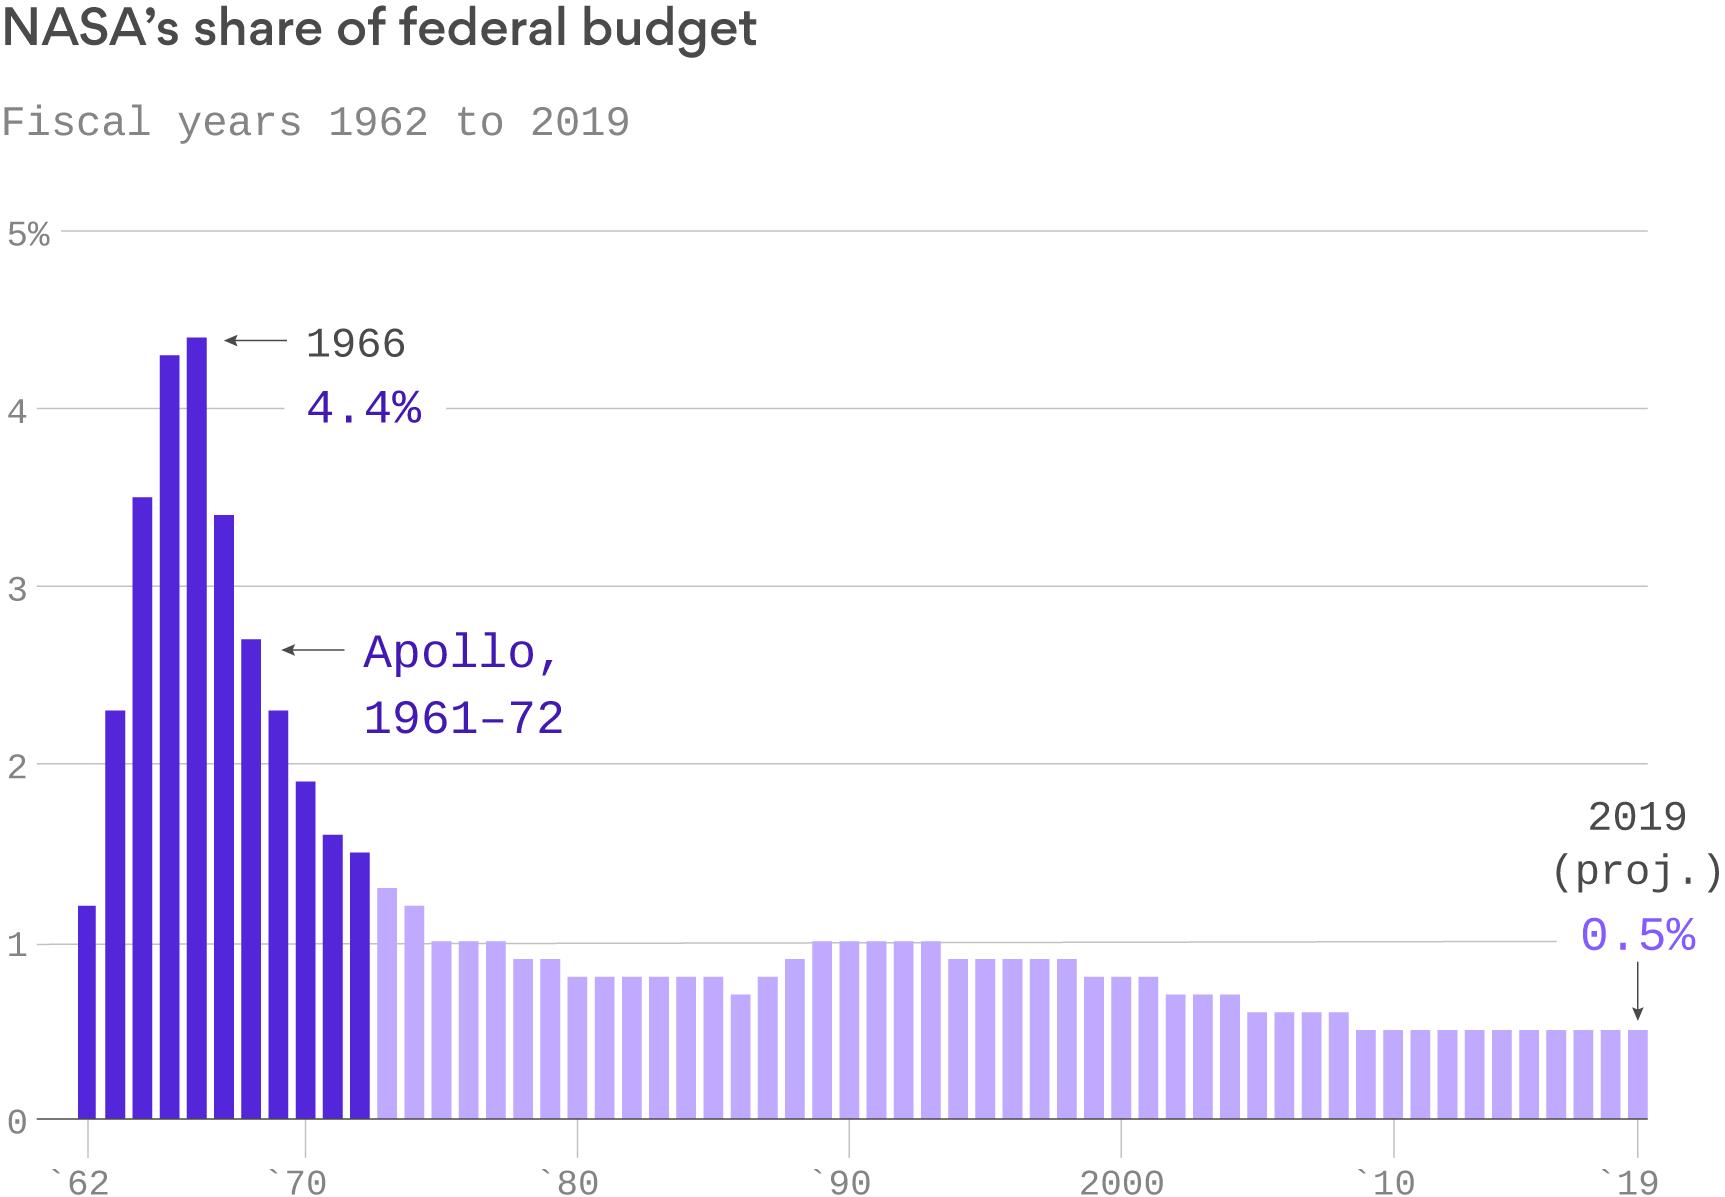 NASA budget share 1962 - 2019